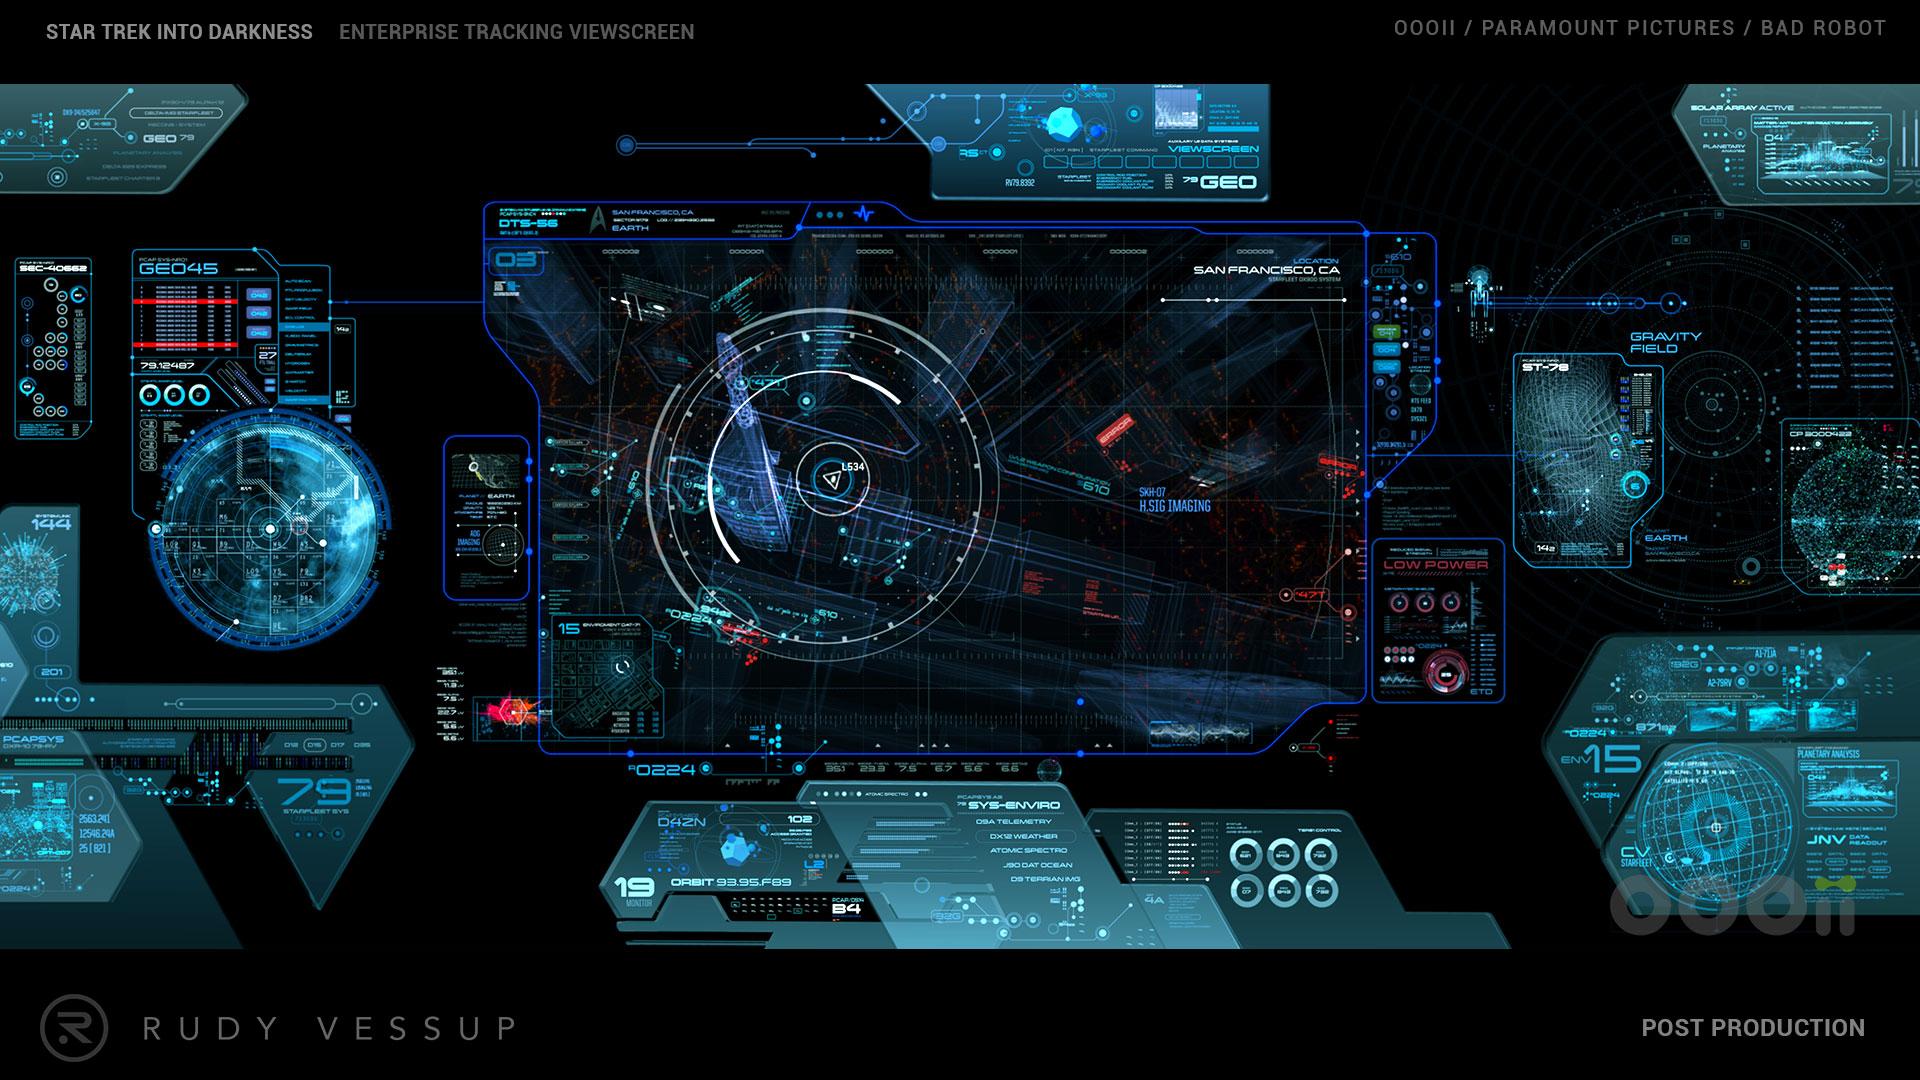 star_trek_tracking_viewscreen_interface_design1.jpg